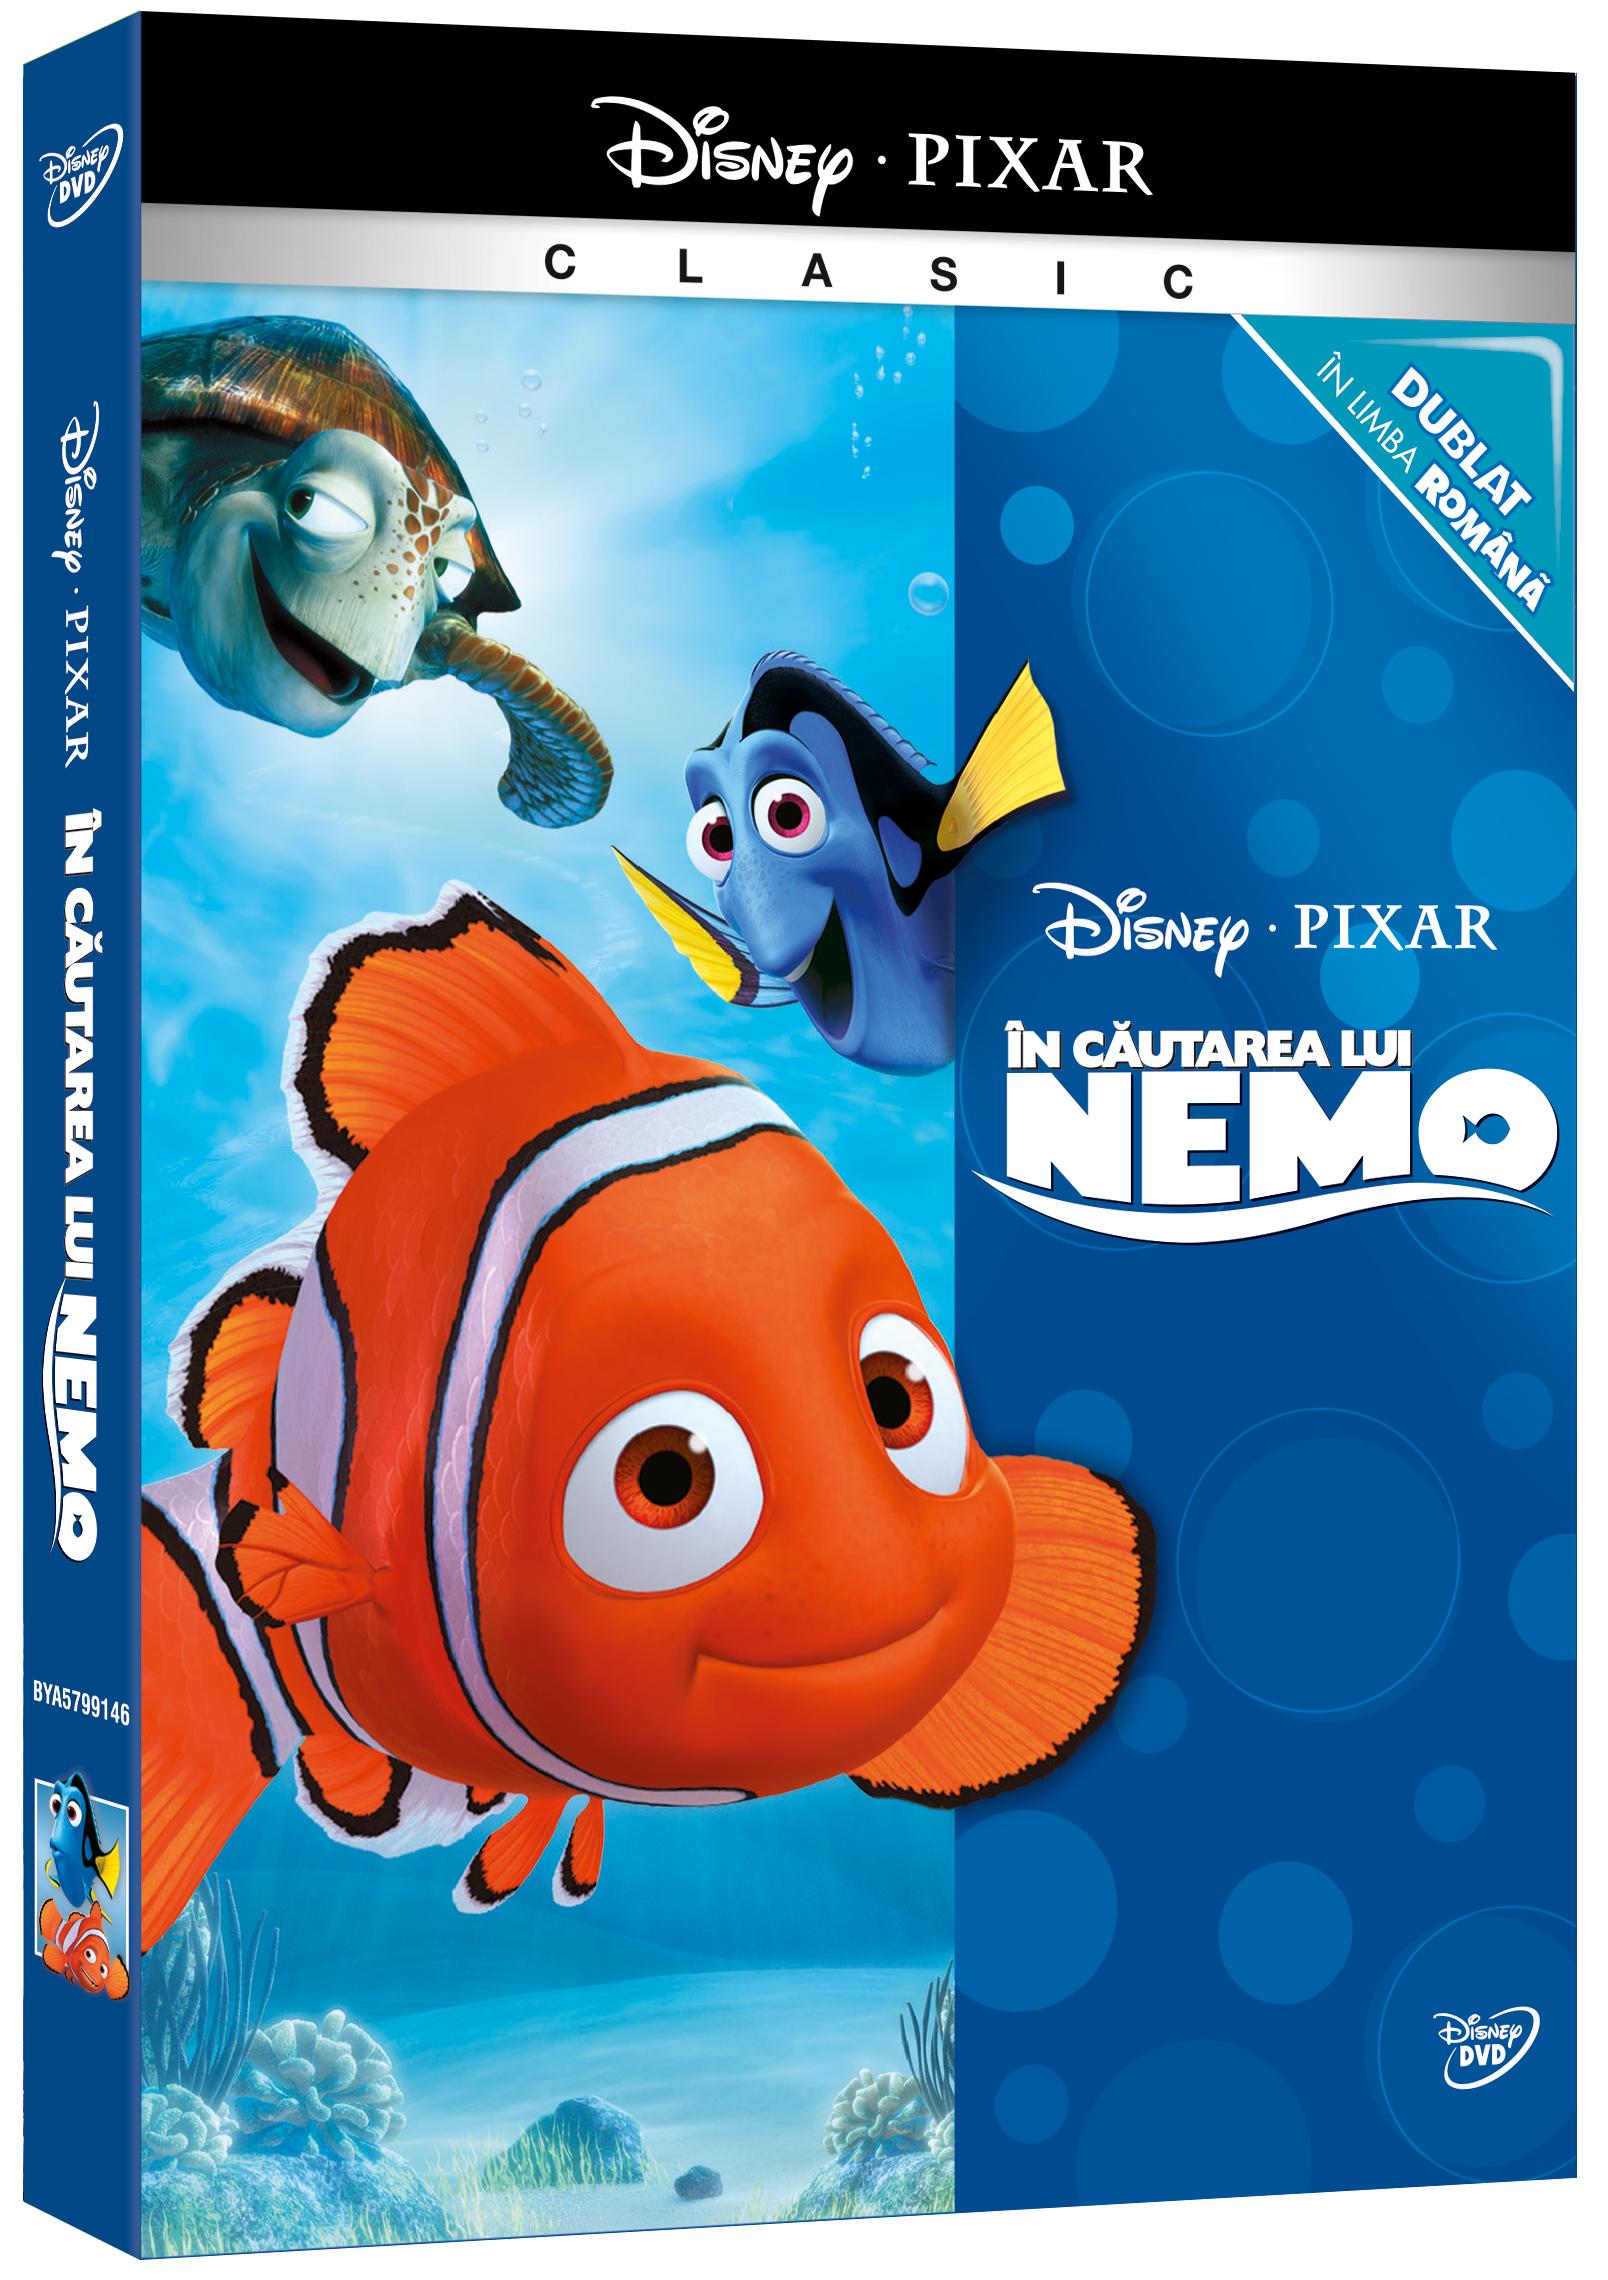 In cautarea lui Nemo / Finding Nemo thumbnail